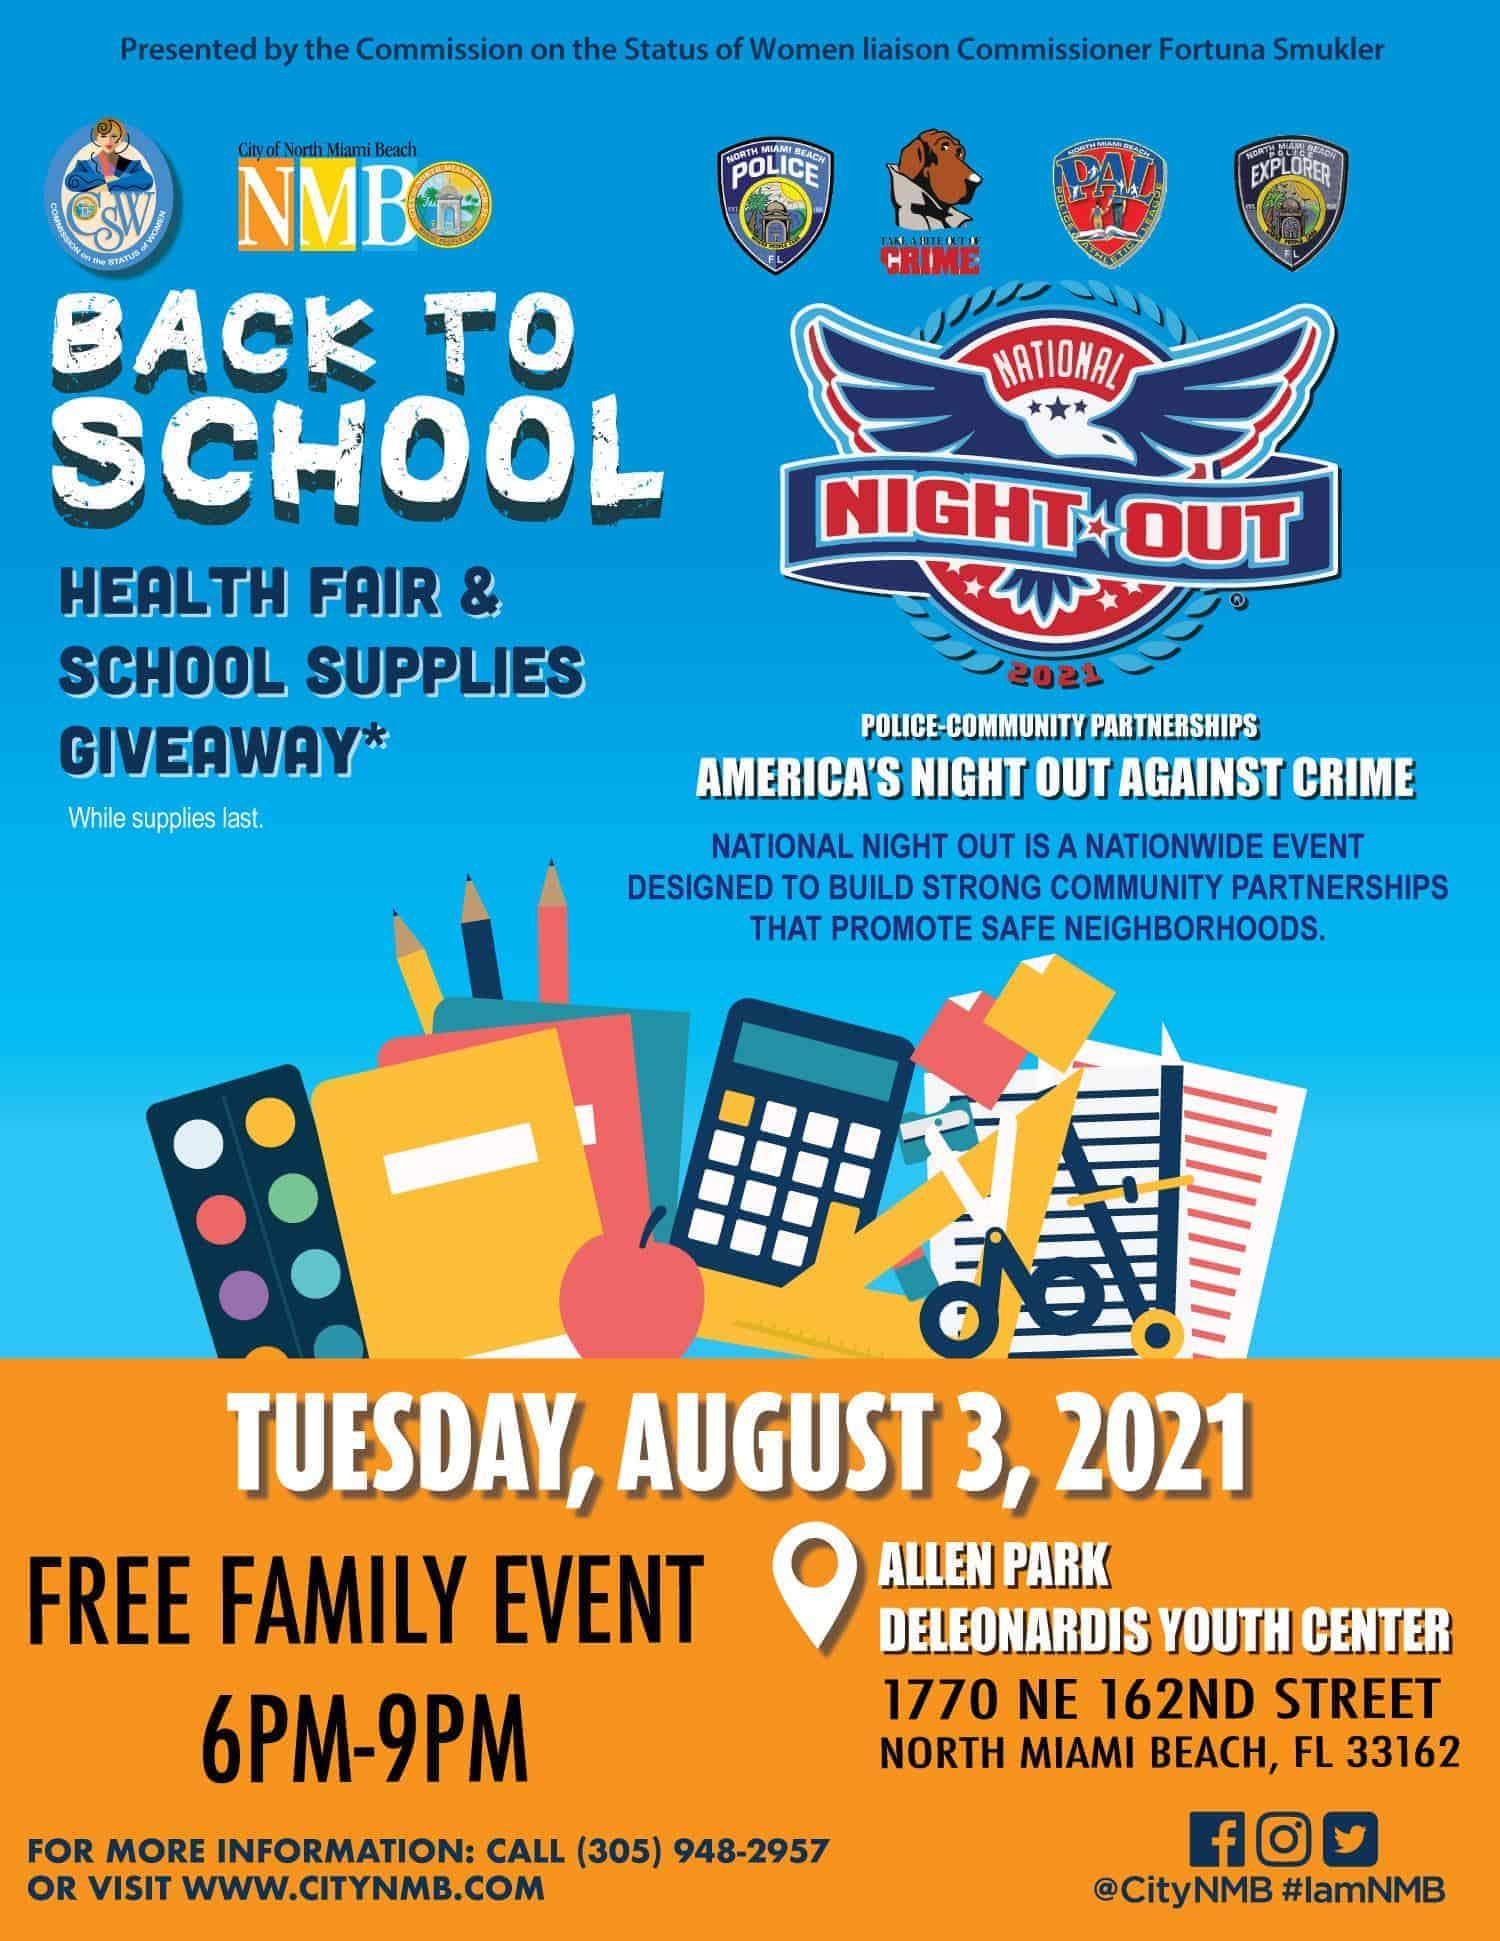 City of North Miami Beach - Health Fair - Back To School